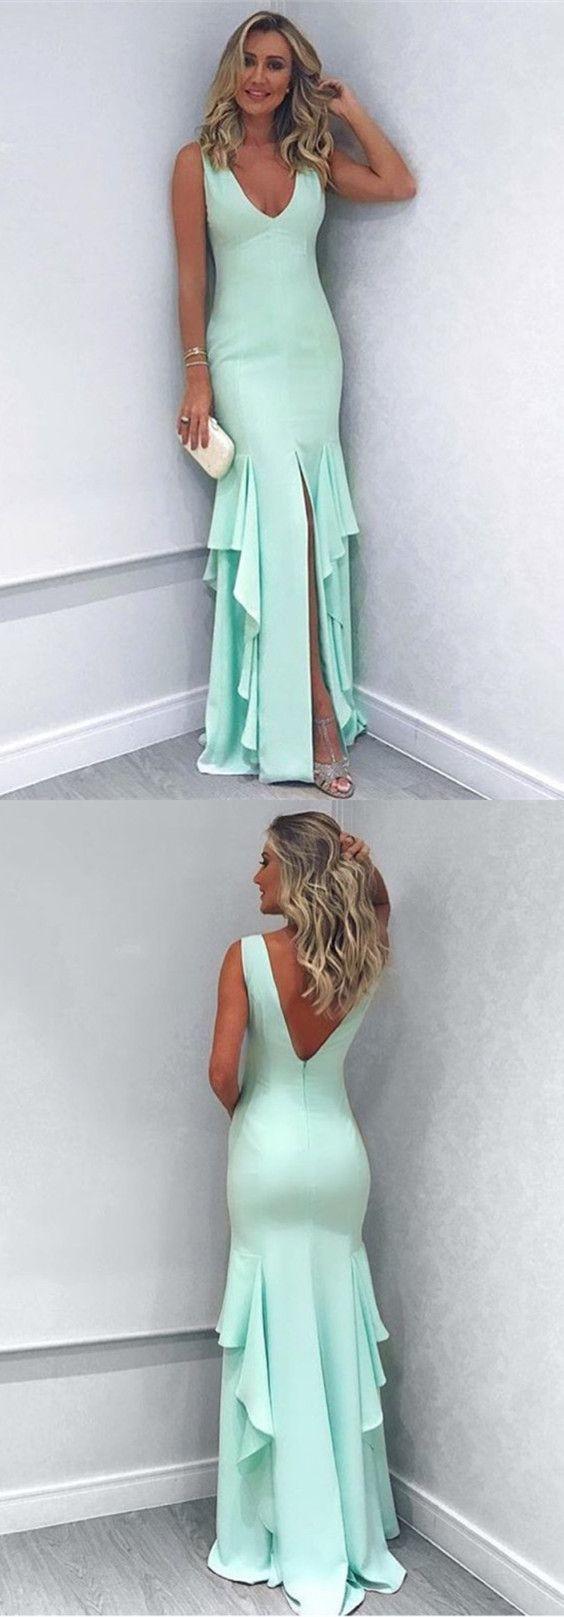 sexy leg slit long mermaid prom dresses by Miss Zhu Bridal on Zibbet